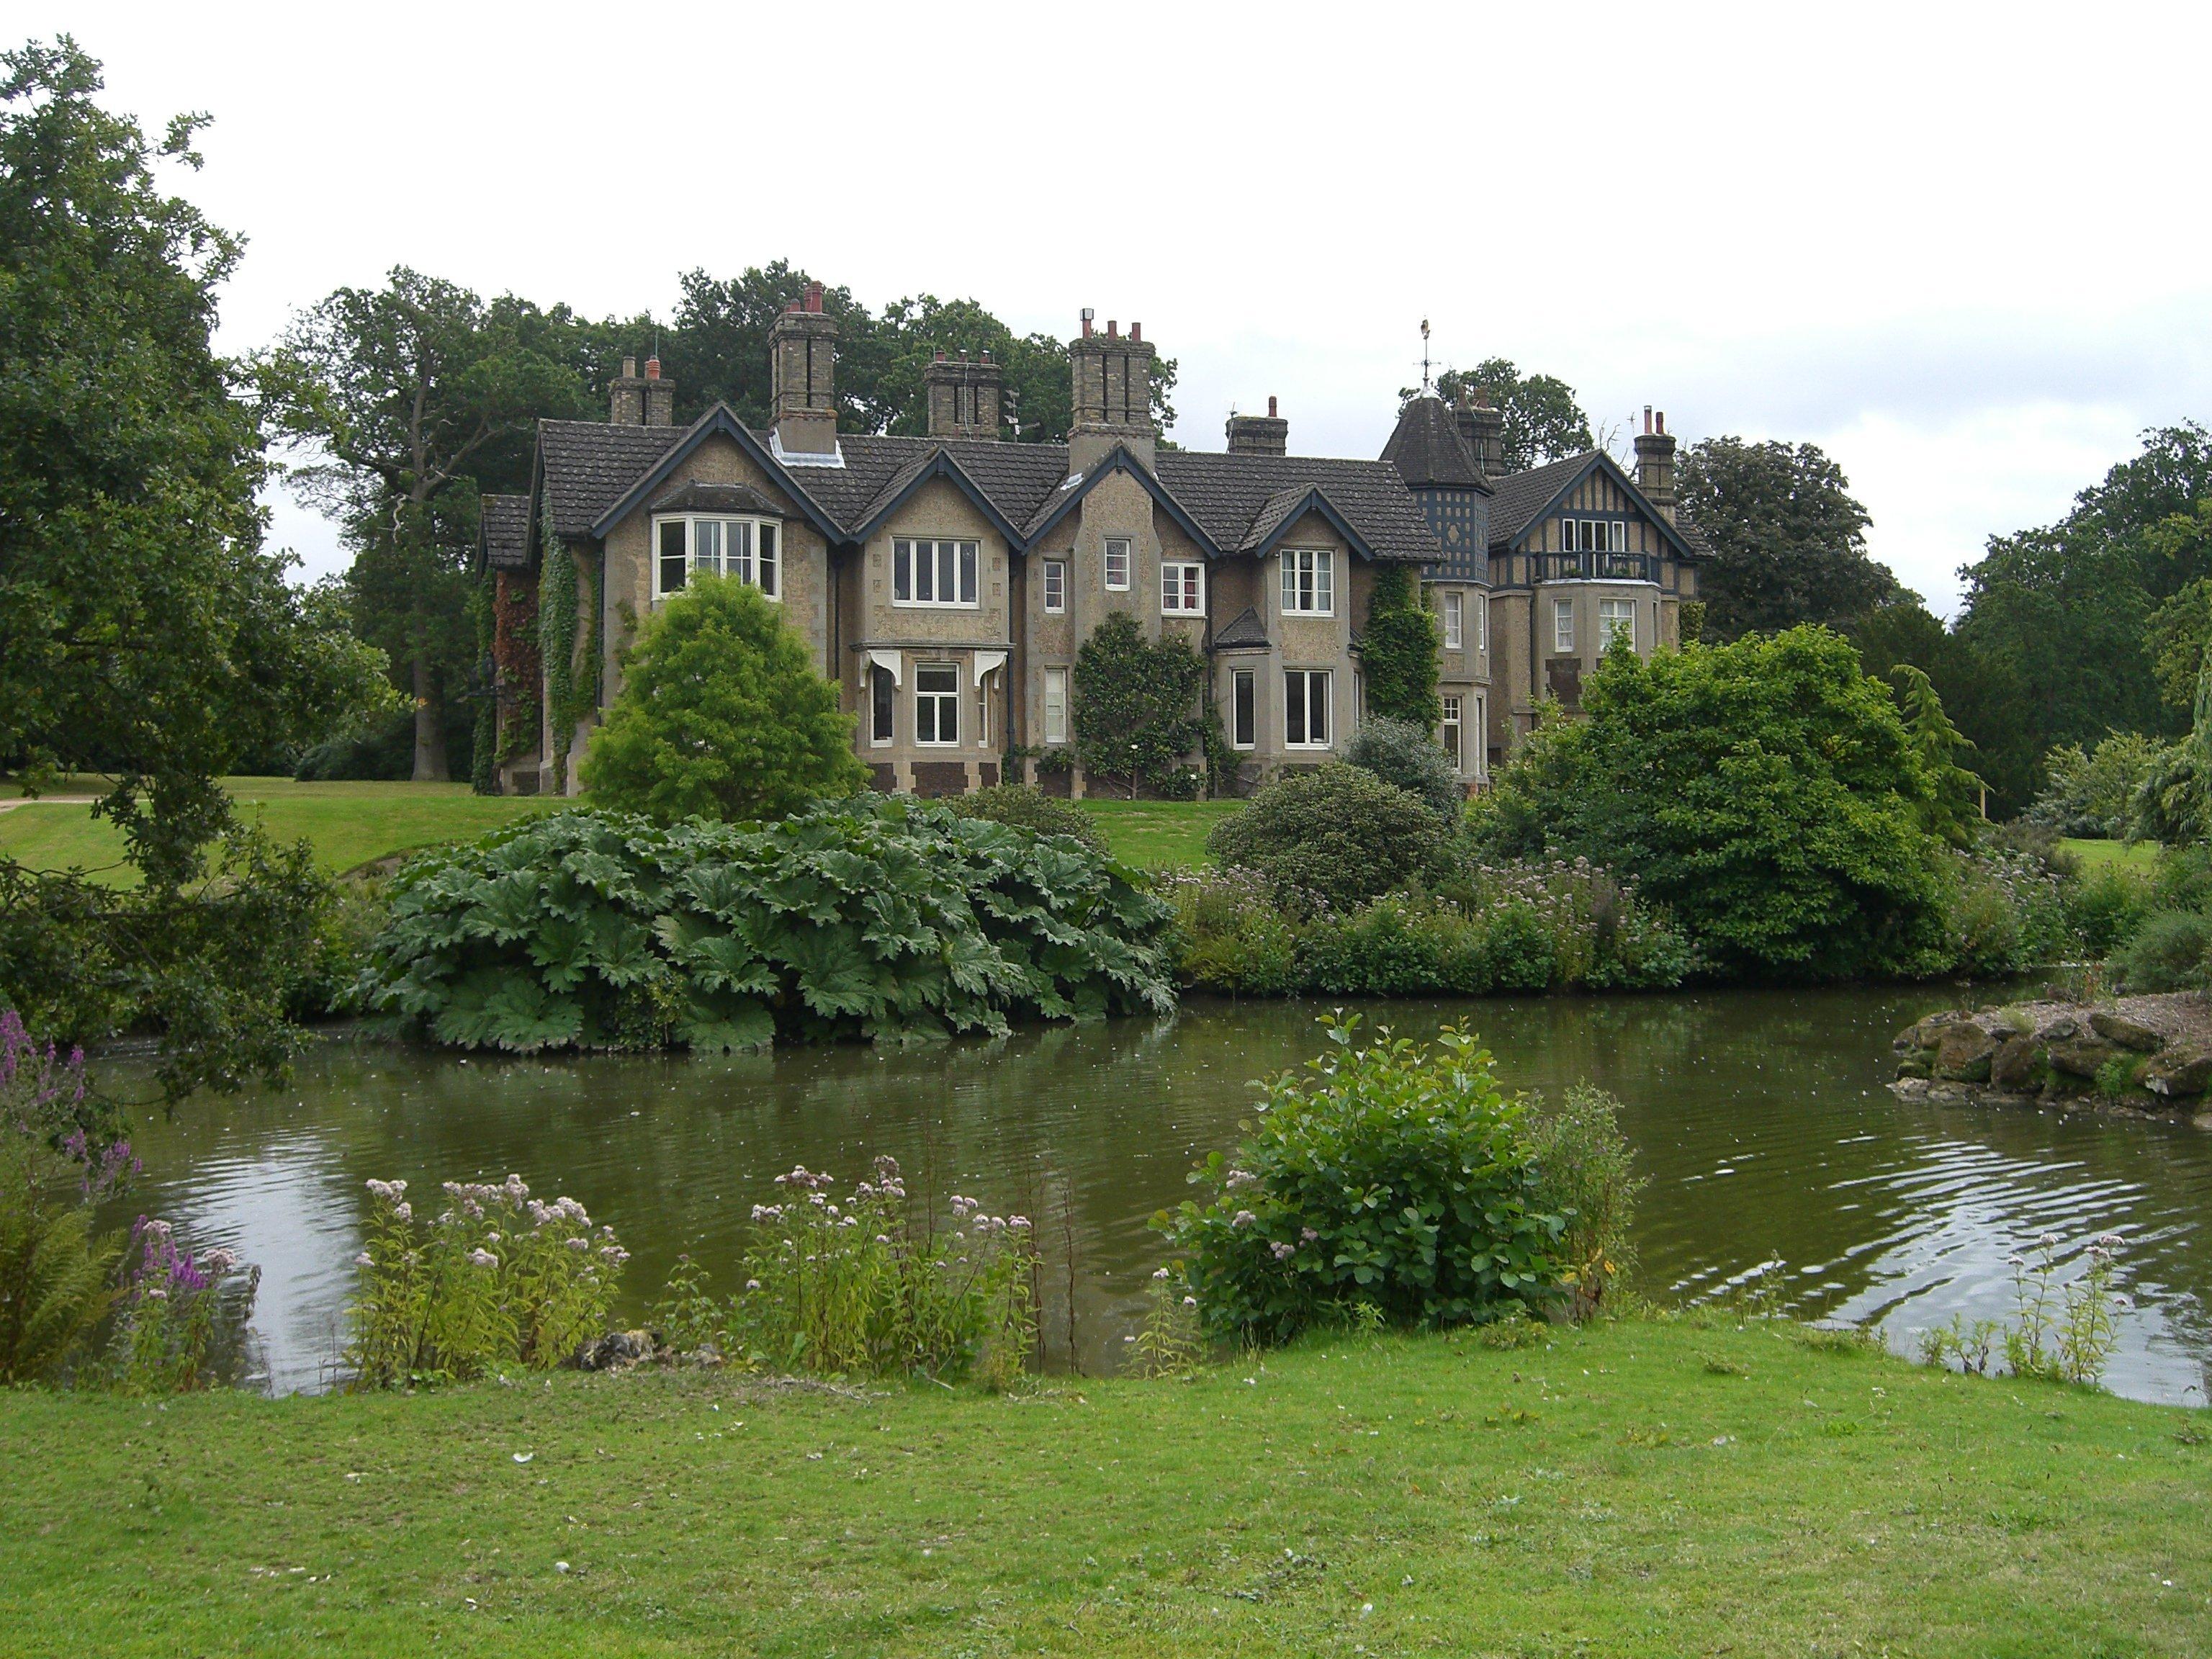 Vista del exterior de la propiedad / Wikimedia commons